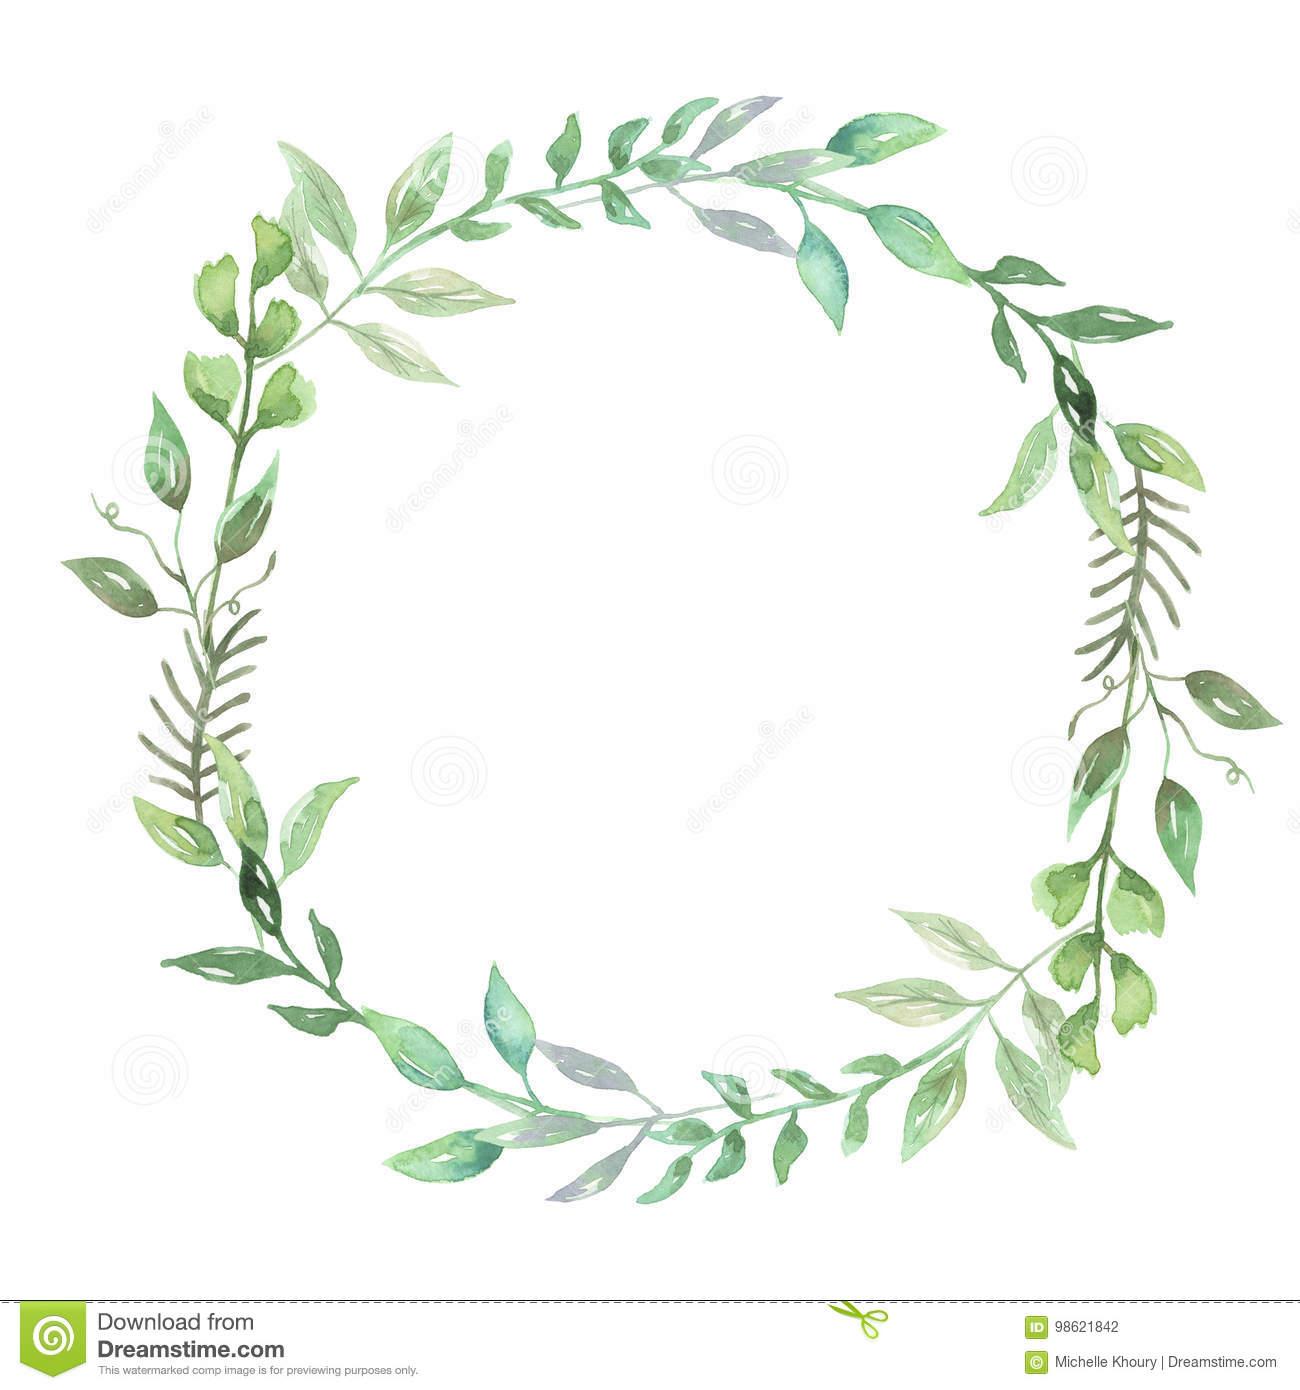 Watercolor Greenery Leaf Wreath Garland Spring Summer.